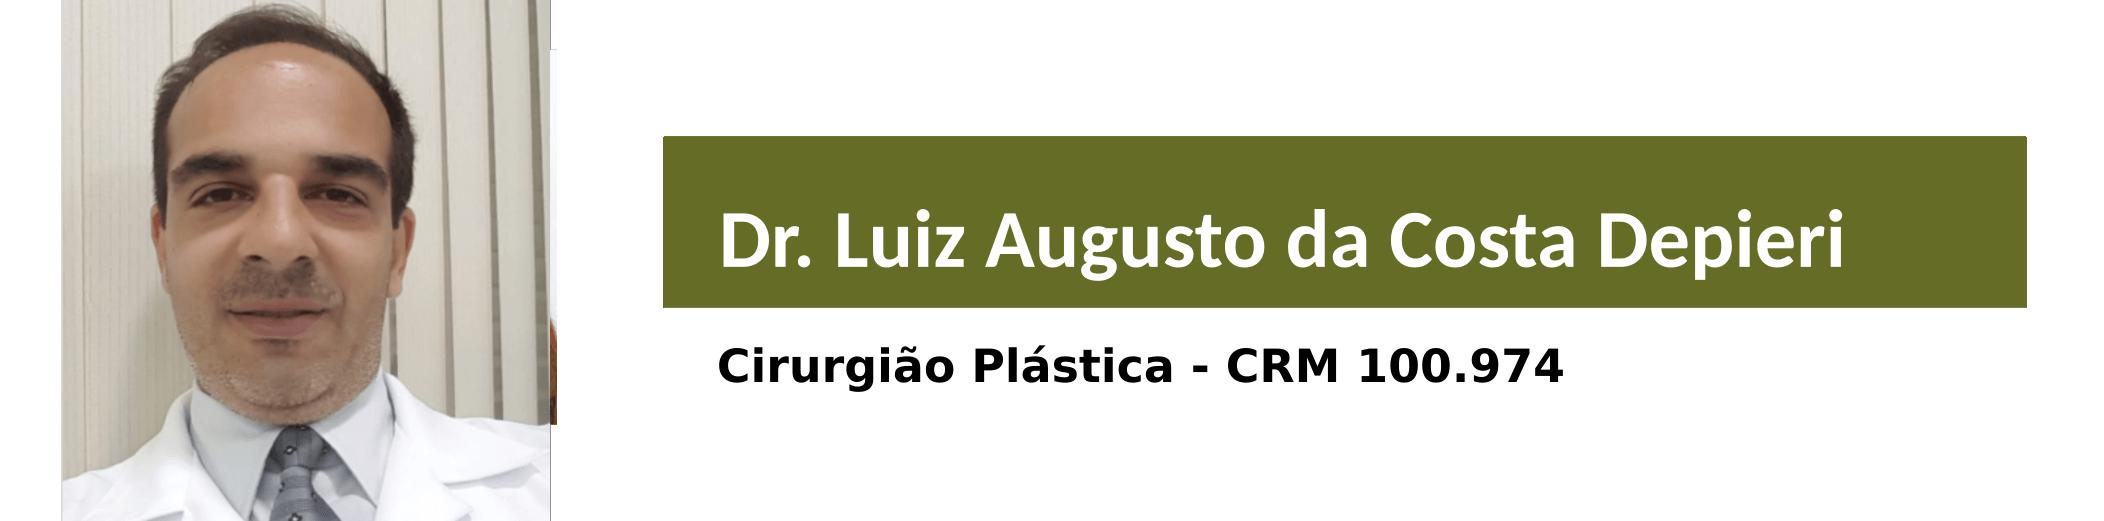 especialista dr luis augusto da costa depieri 080419